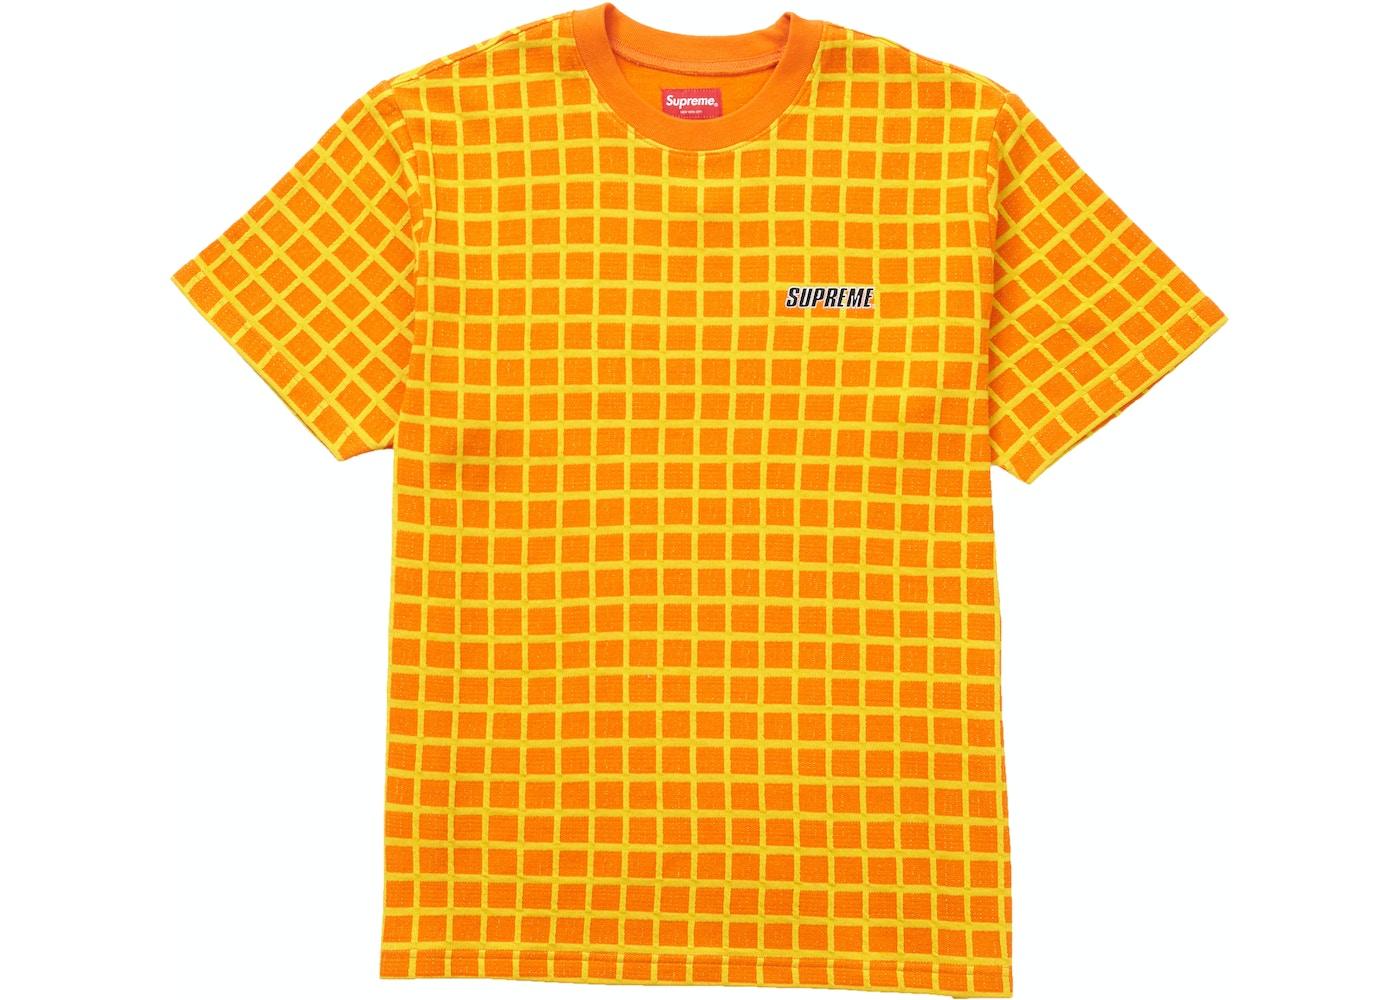 7d8ab82a Supreme Grid Jacquard S/S Top Orange - SS19